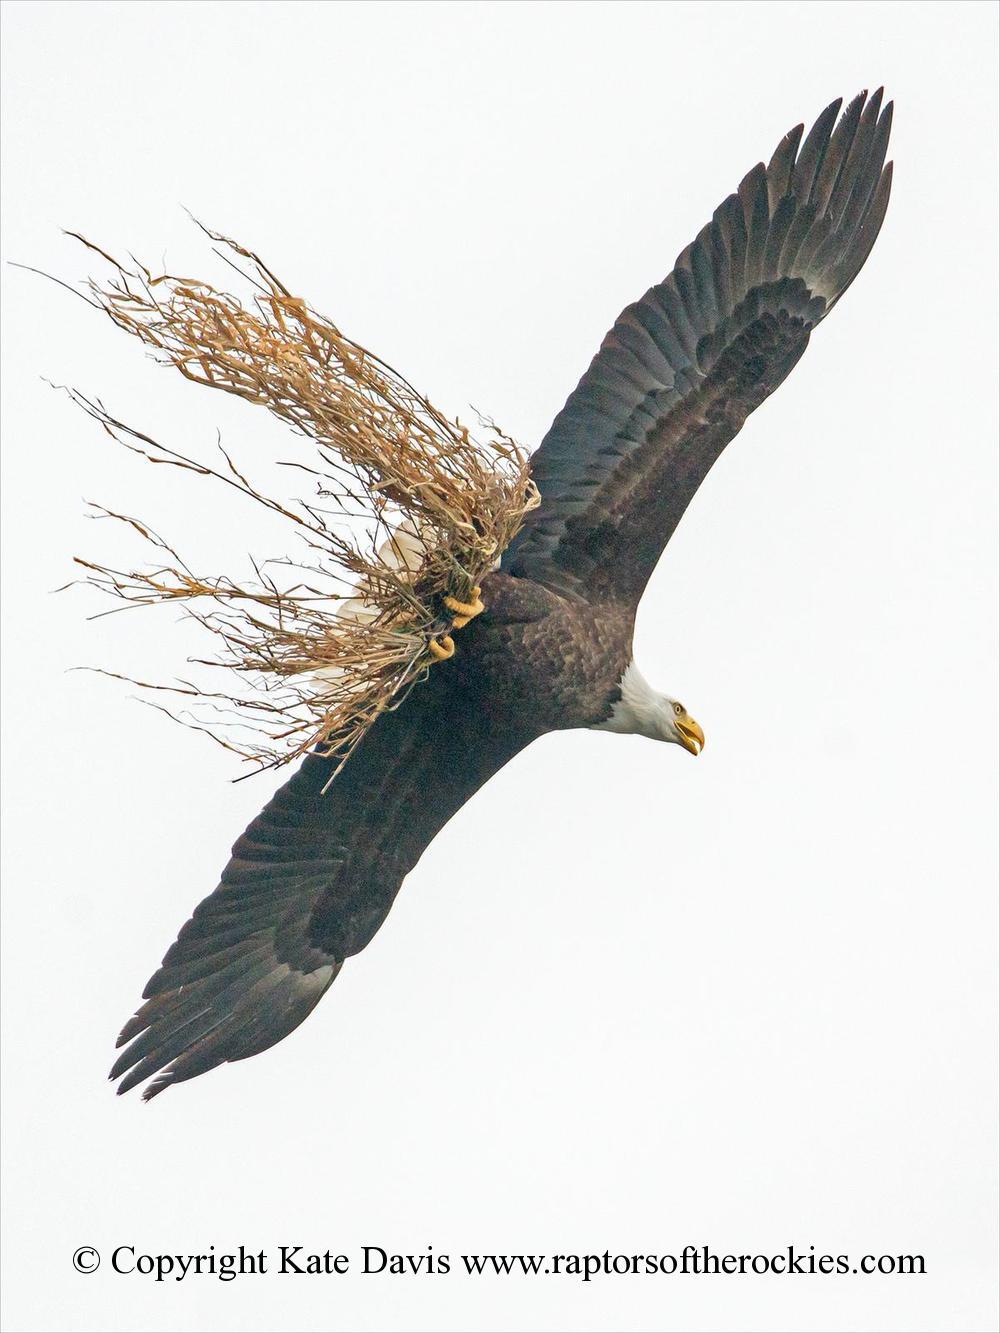 American Bald Eagle - Hauling Grass - Golden Eagle - Bald Eagle hauling grass to the nest